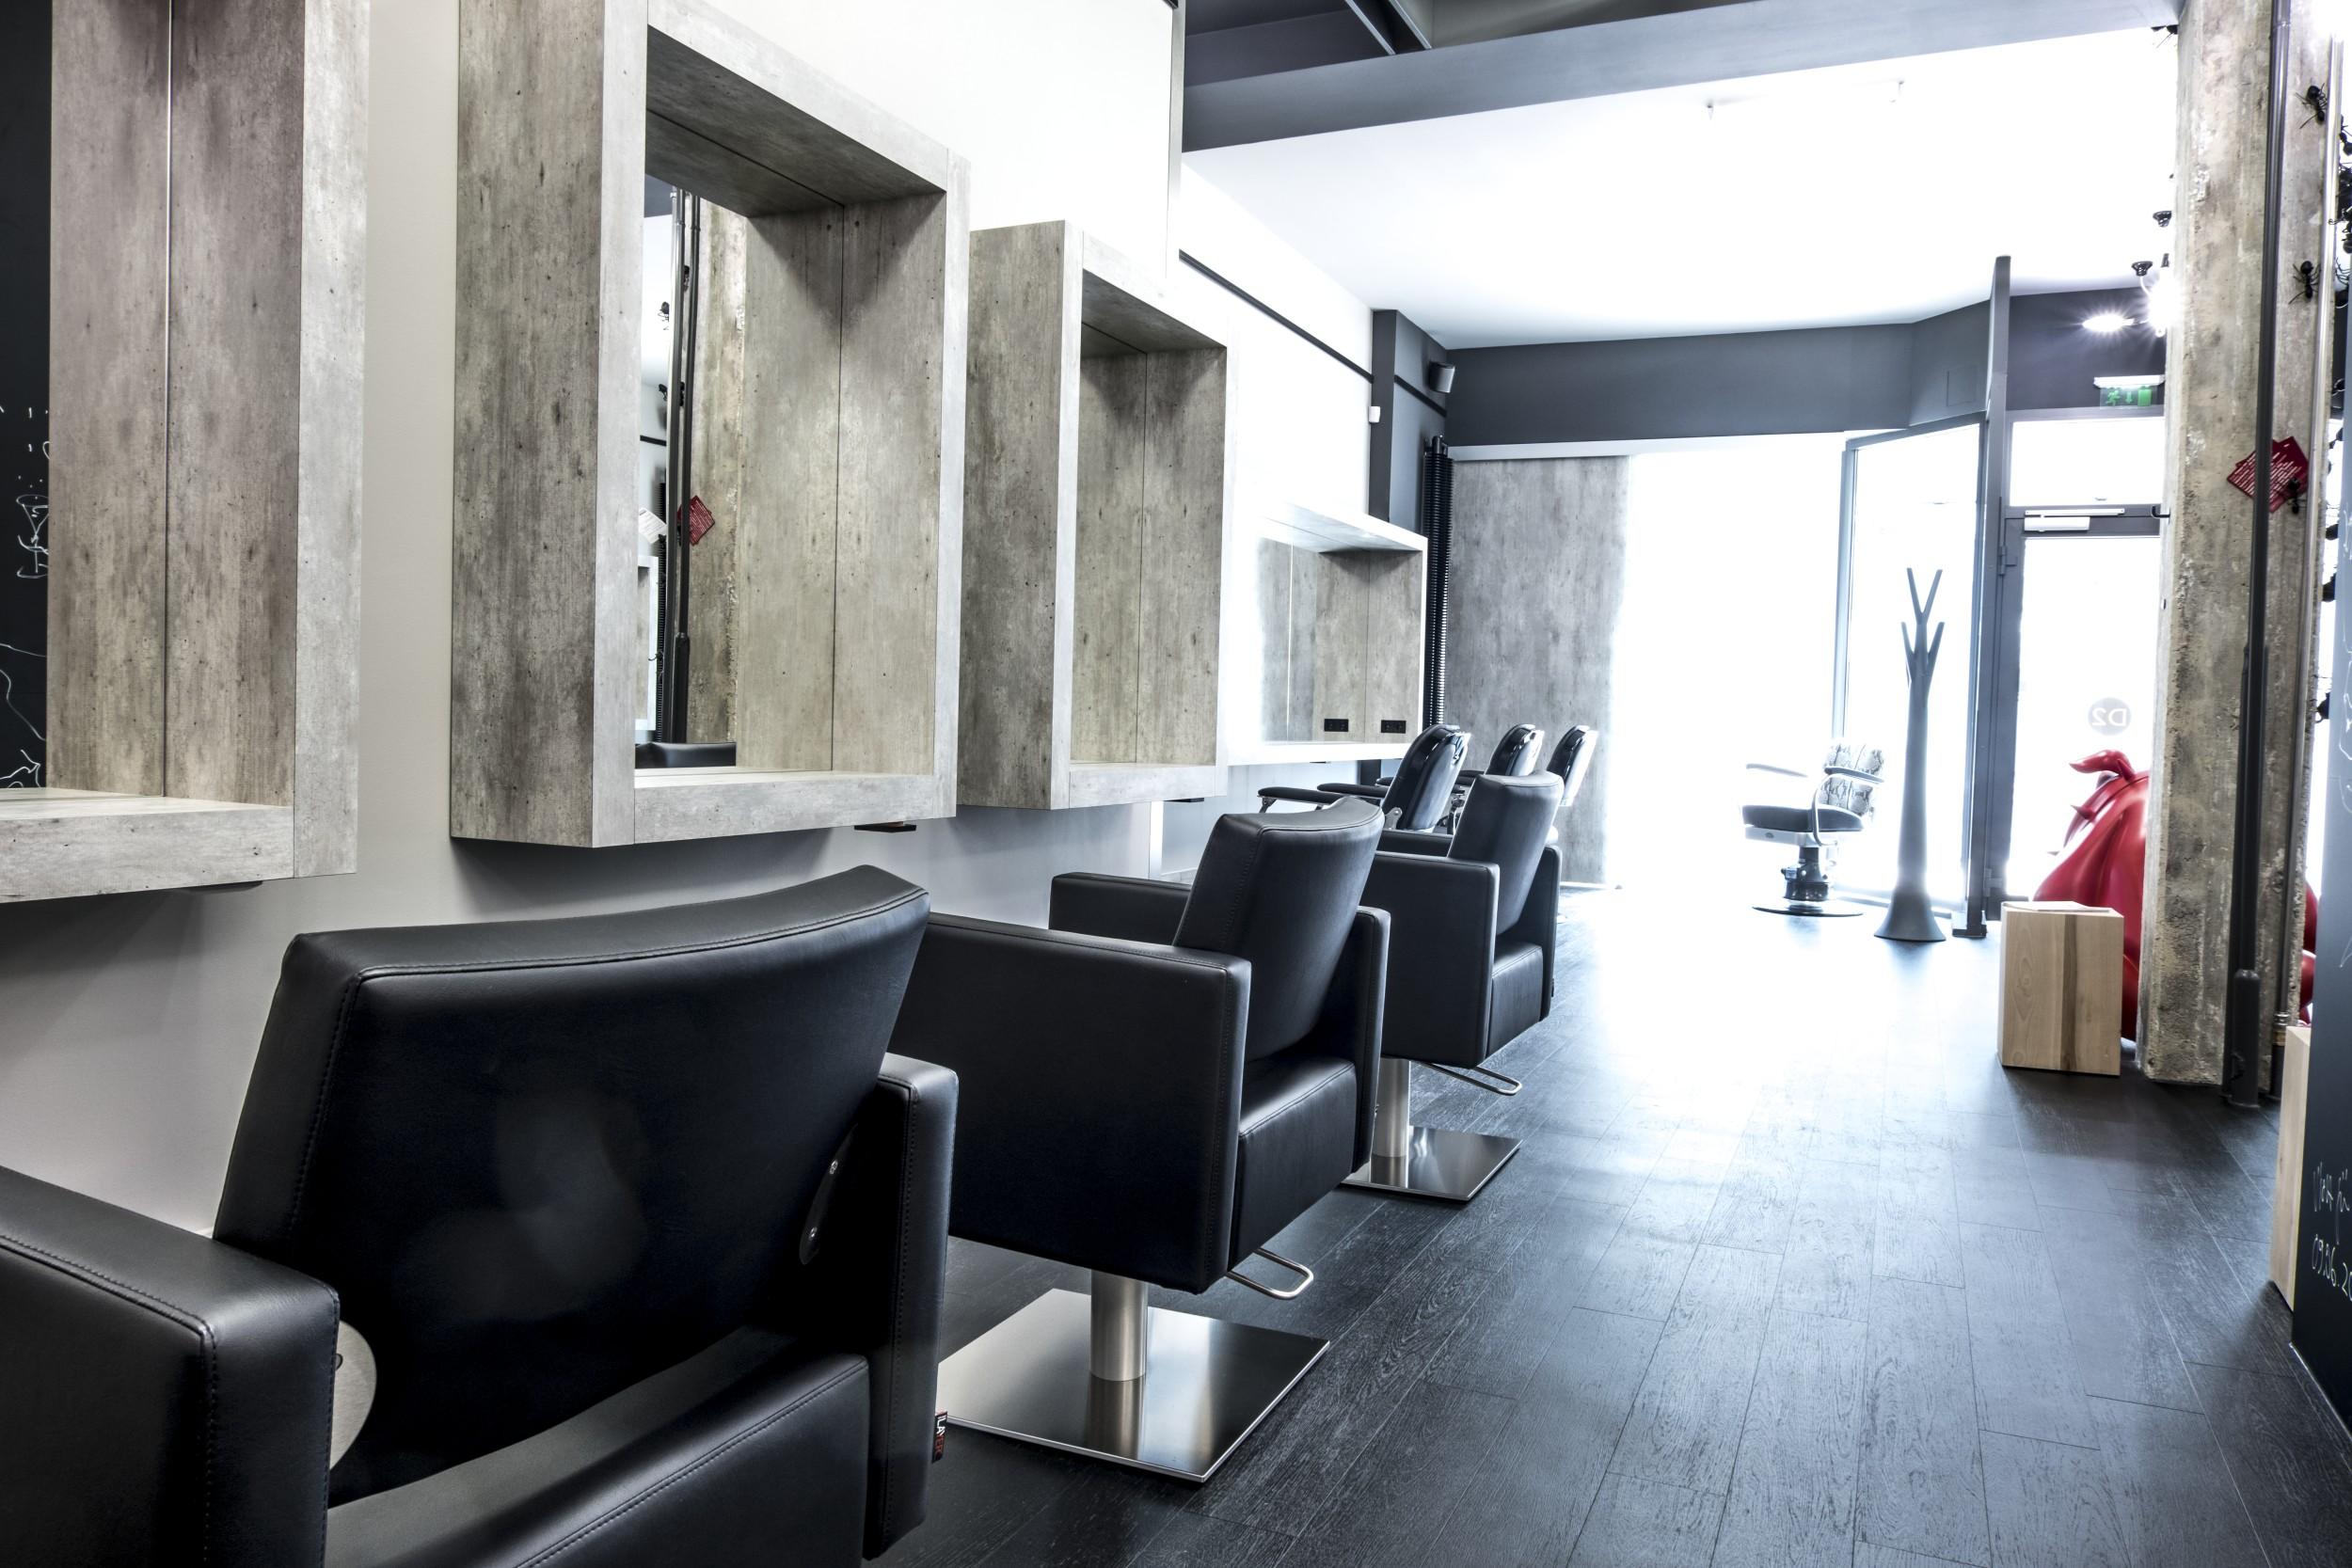 Kopfgeld Friseure Euer Friseur Der Zukunft